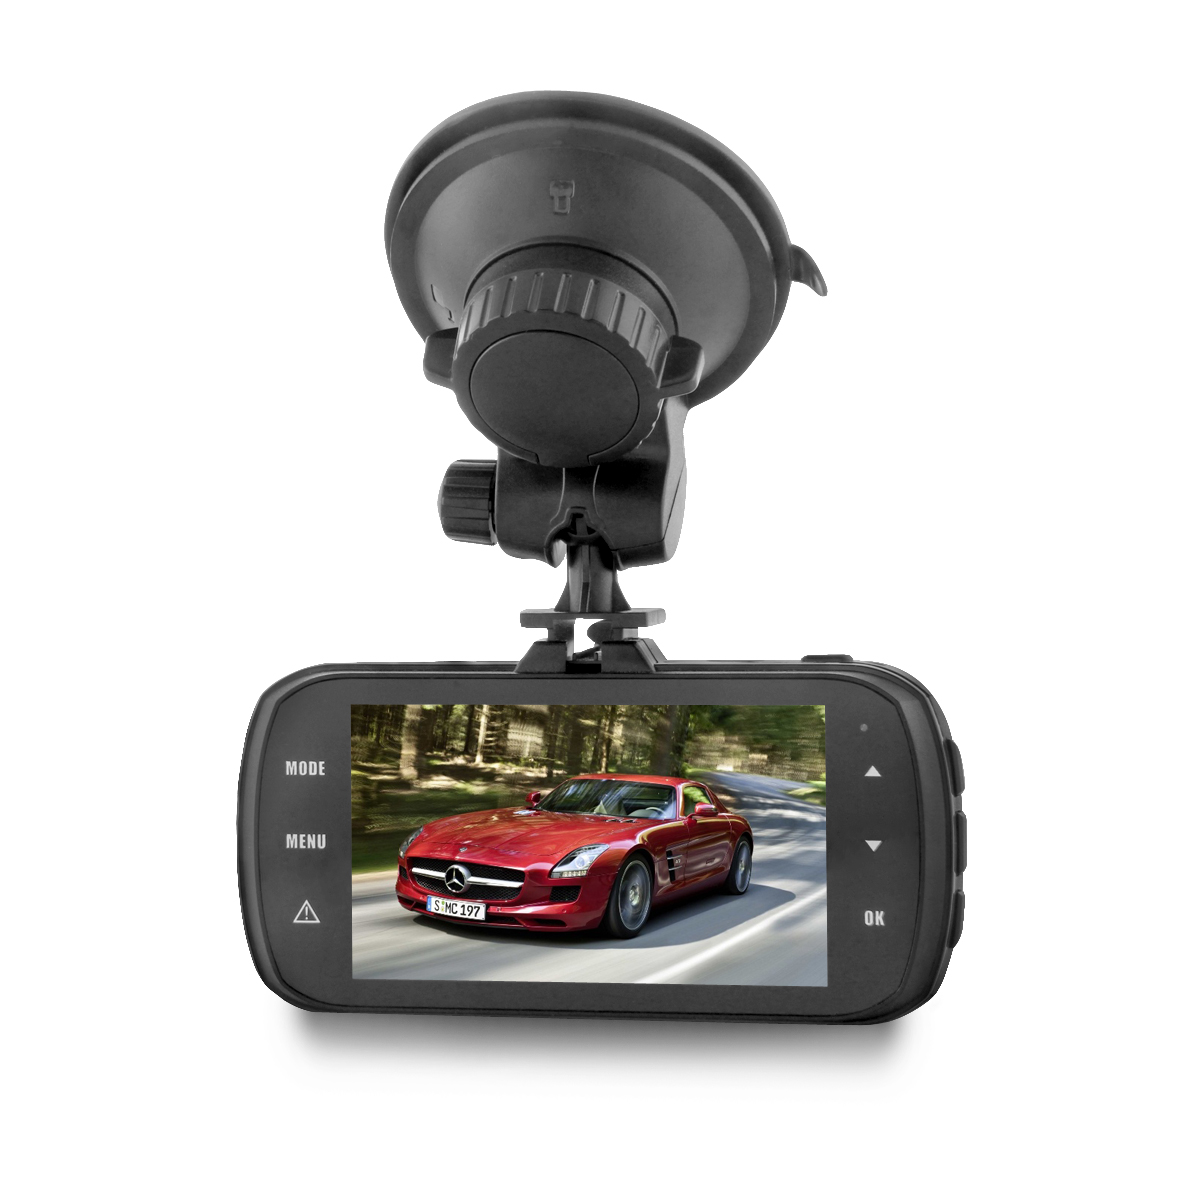 Azdome DAB205 Car Camera Ambarella A12 2560*1440P Video Recorder Dash Cam 3.0 inch LCD 170 degree G-sensor ADAS GPS Car DVR